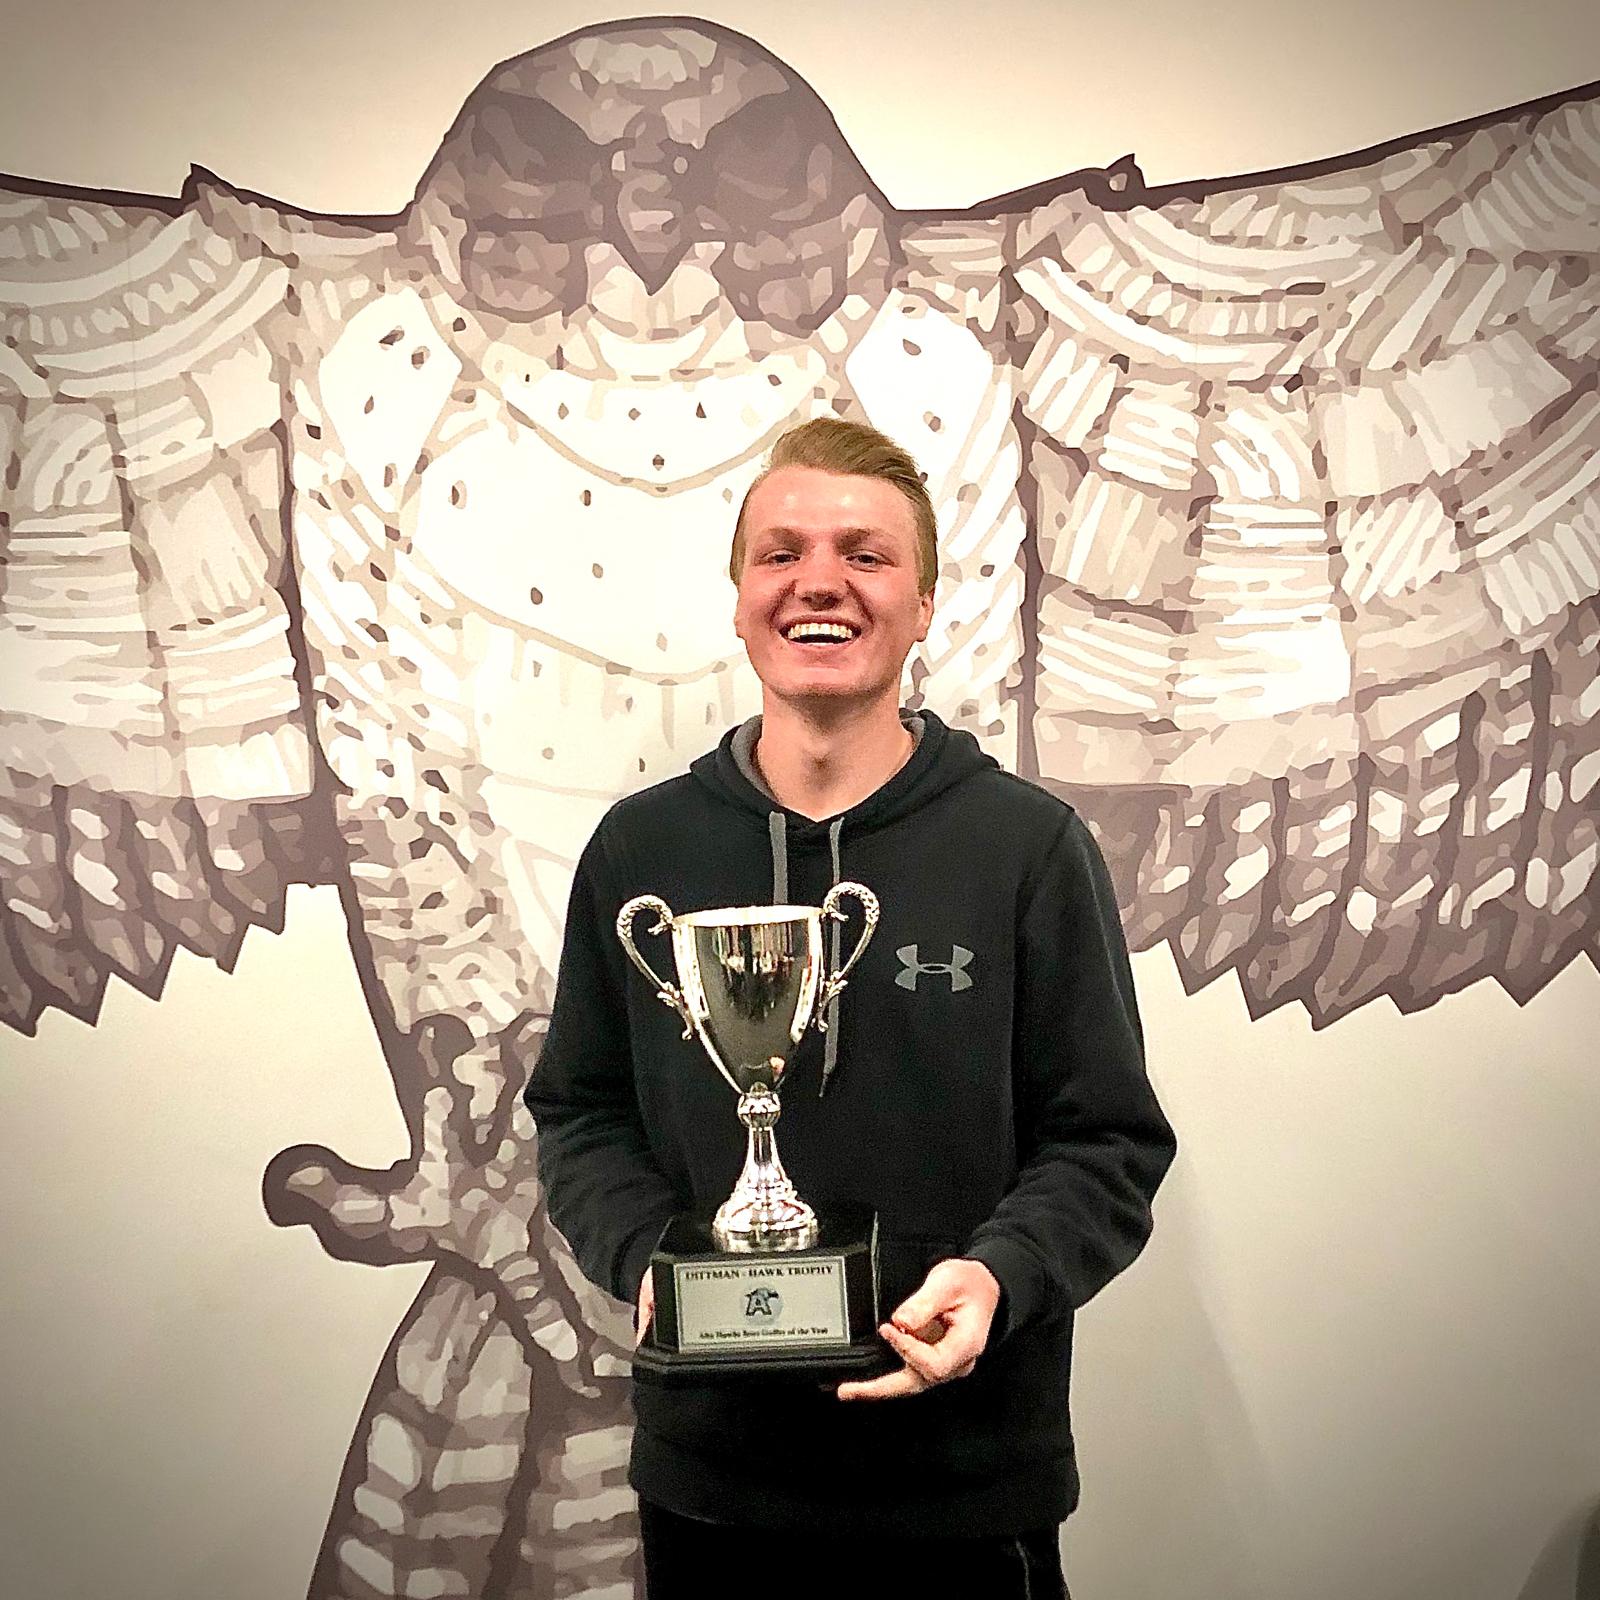 RJ Bonds awarded the Dittman-Hawk Trophy (Alta Golfer of the Year 2019)